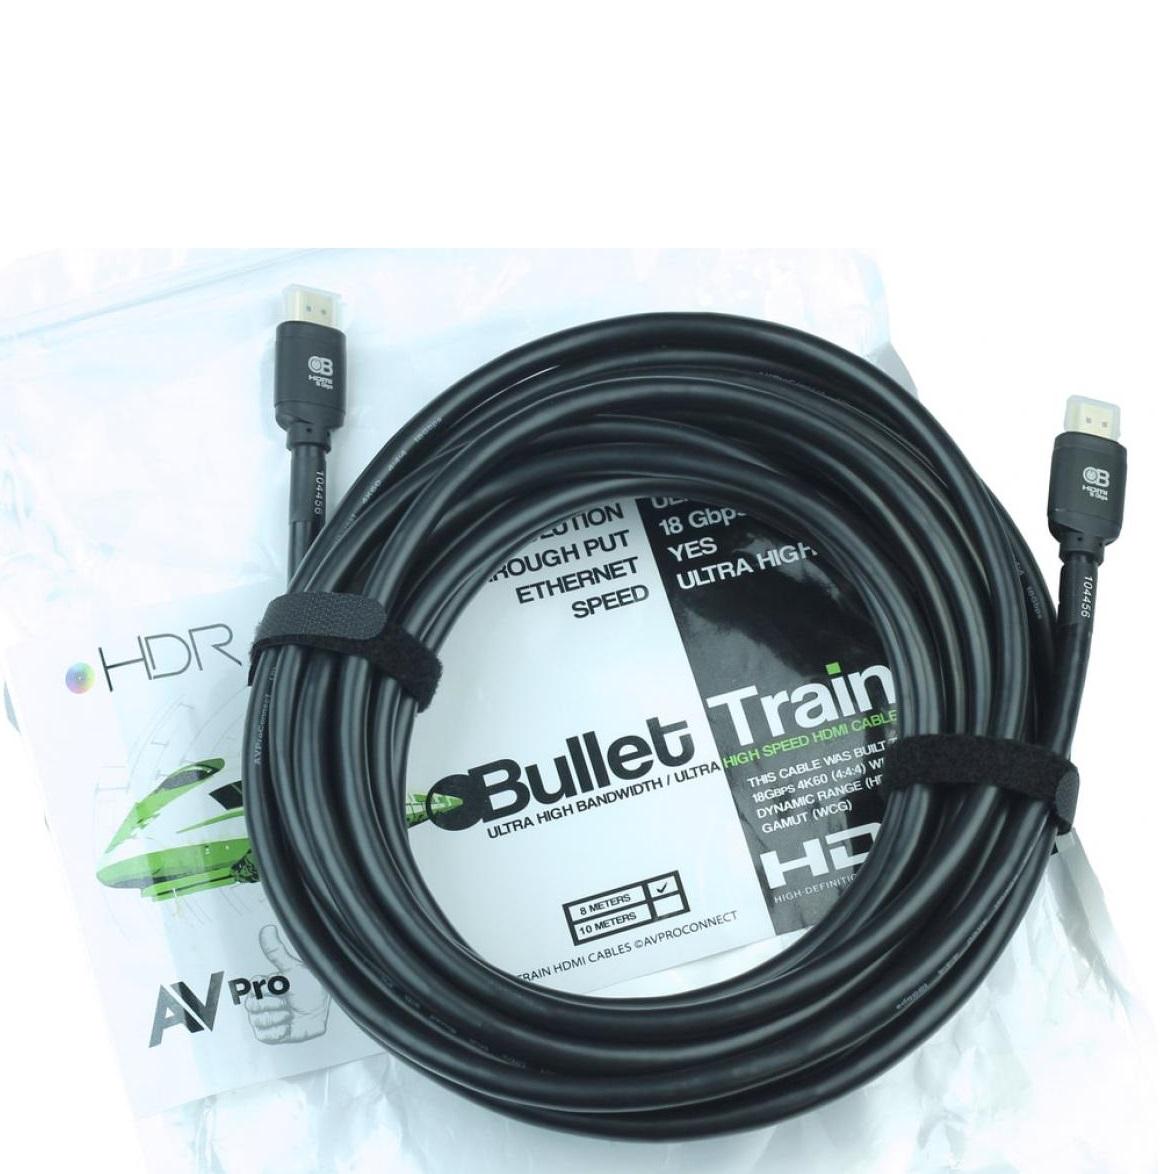 HDMI Ultra High Speed кабель AV Pro Edge AC-BT08-AUHD